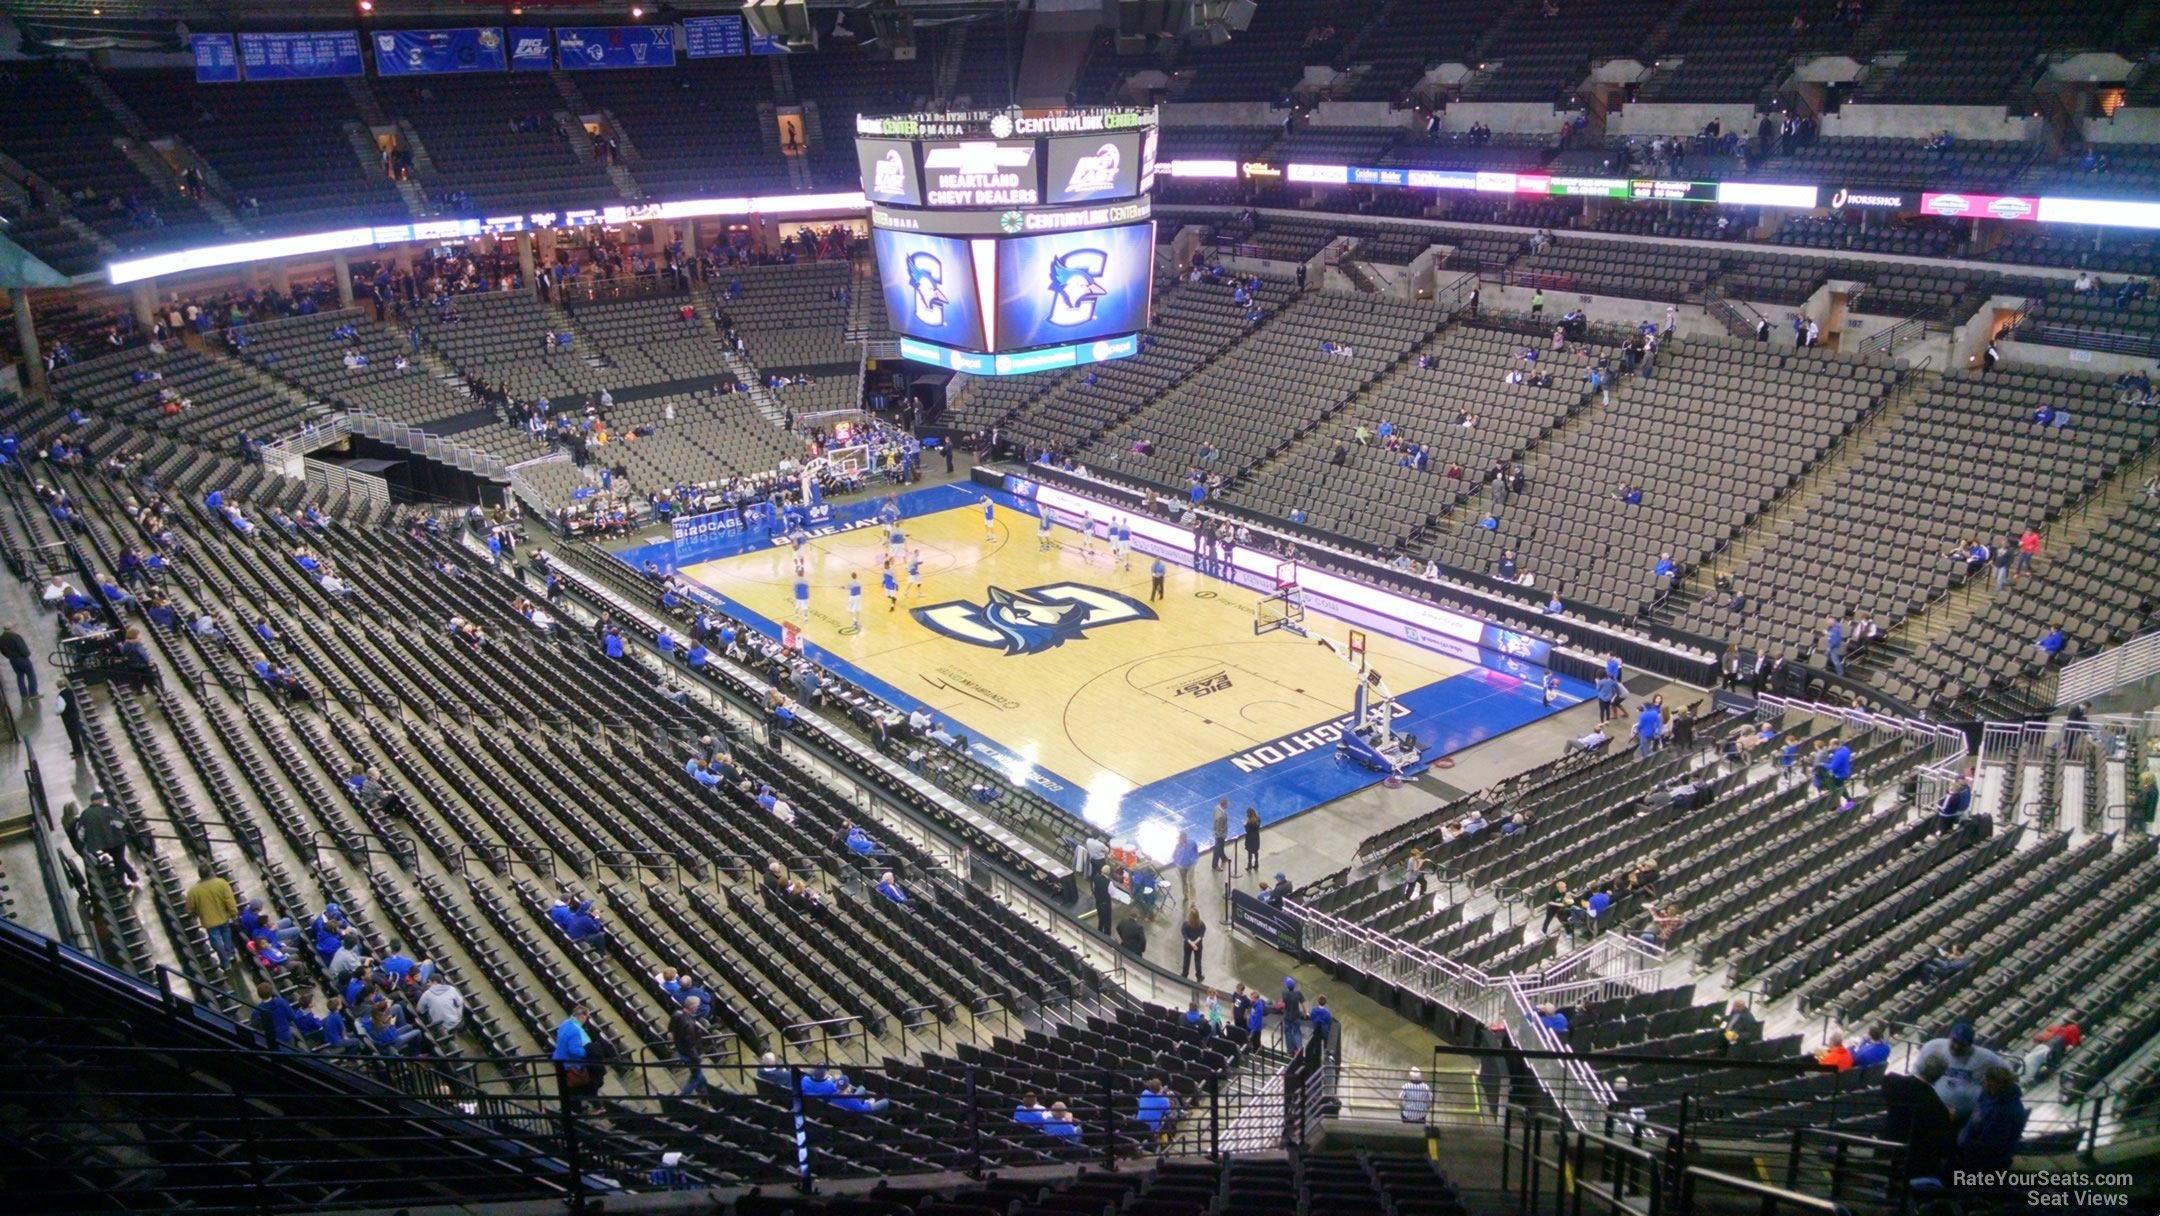 Centurylink Center Omaha >> Chi Health Center Omaha Section 216 Creighton Basketball